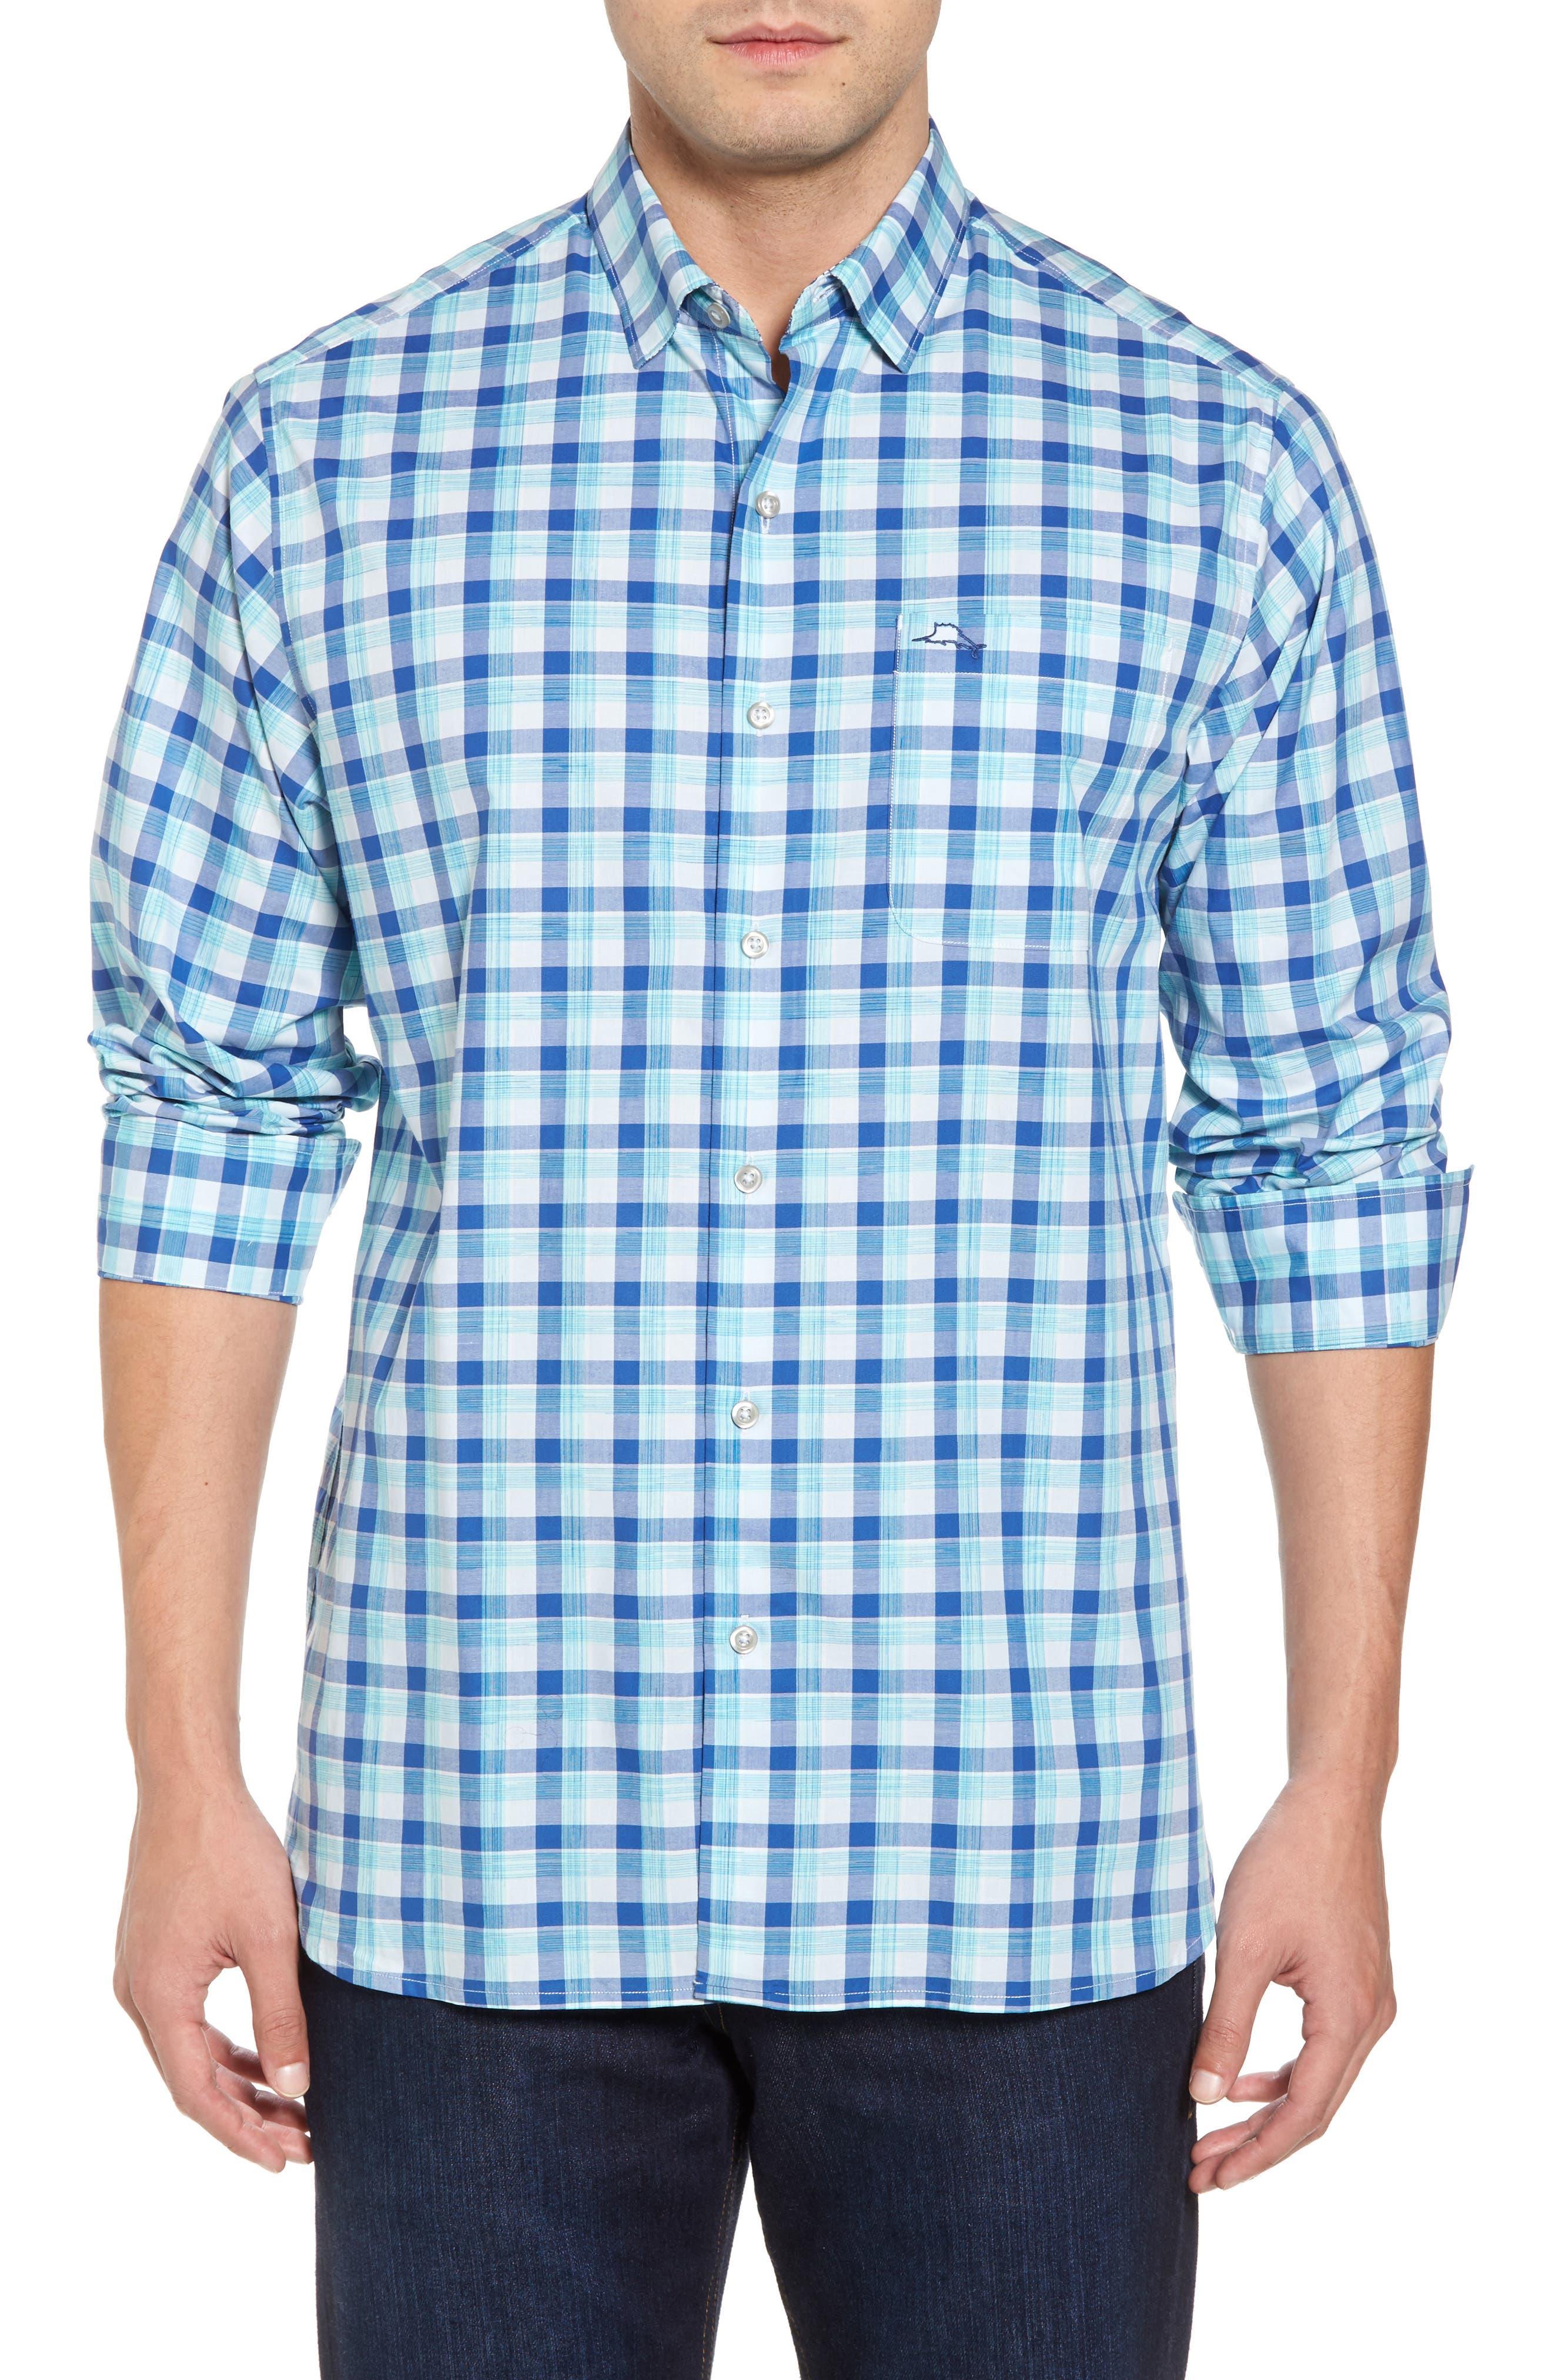 Atlantic Tides Regular Fit Plaid Sport Shirt,                             Main thumbnail 1, color,                             Galaxy Blue